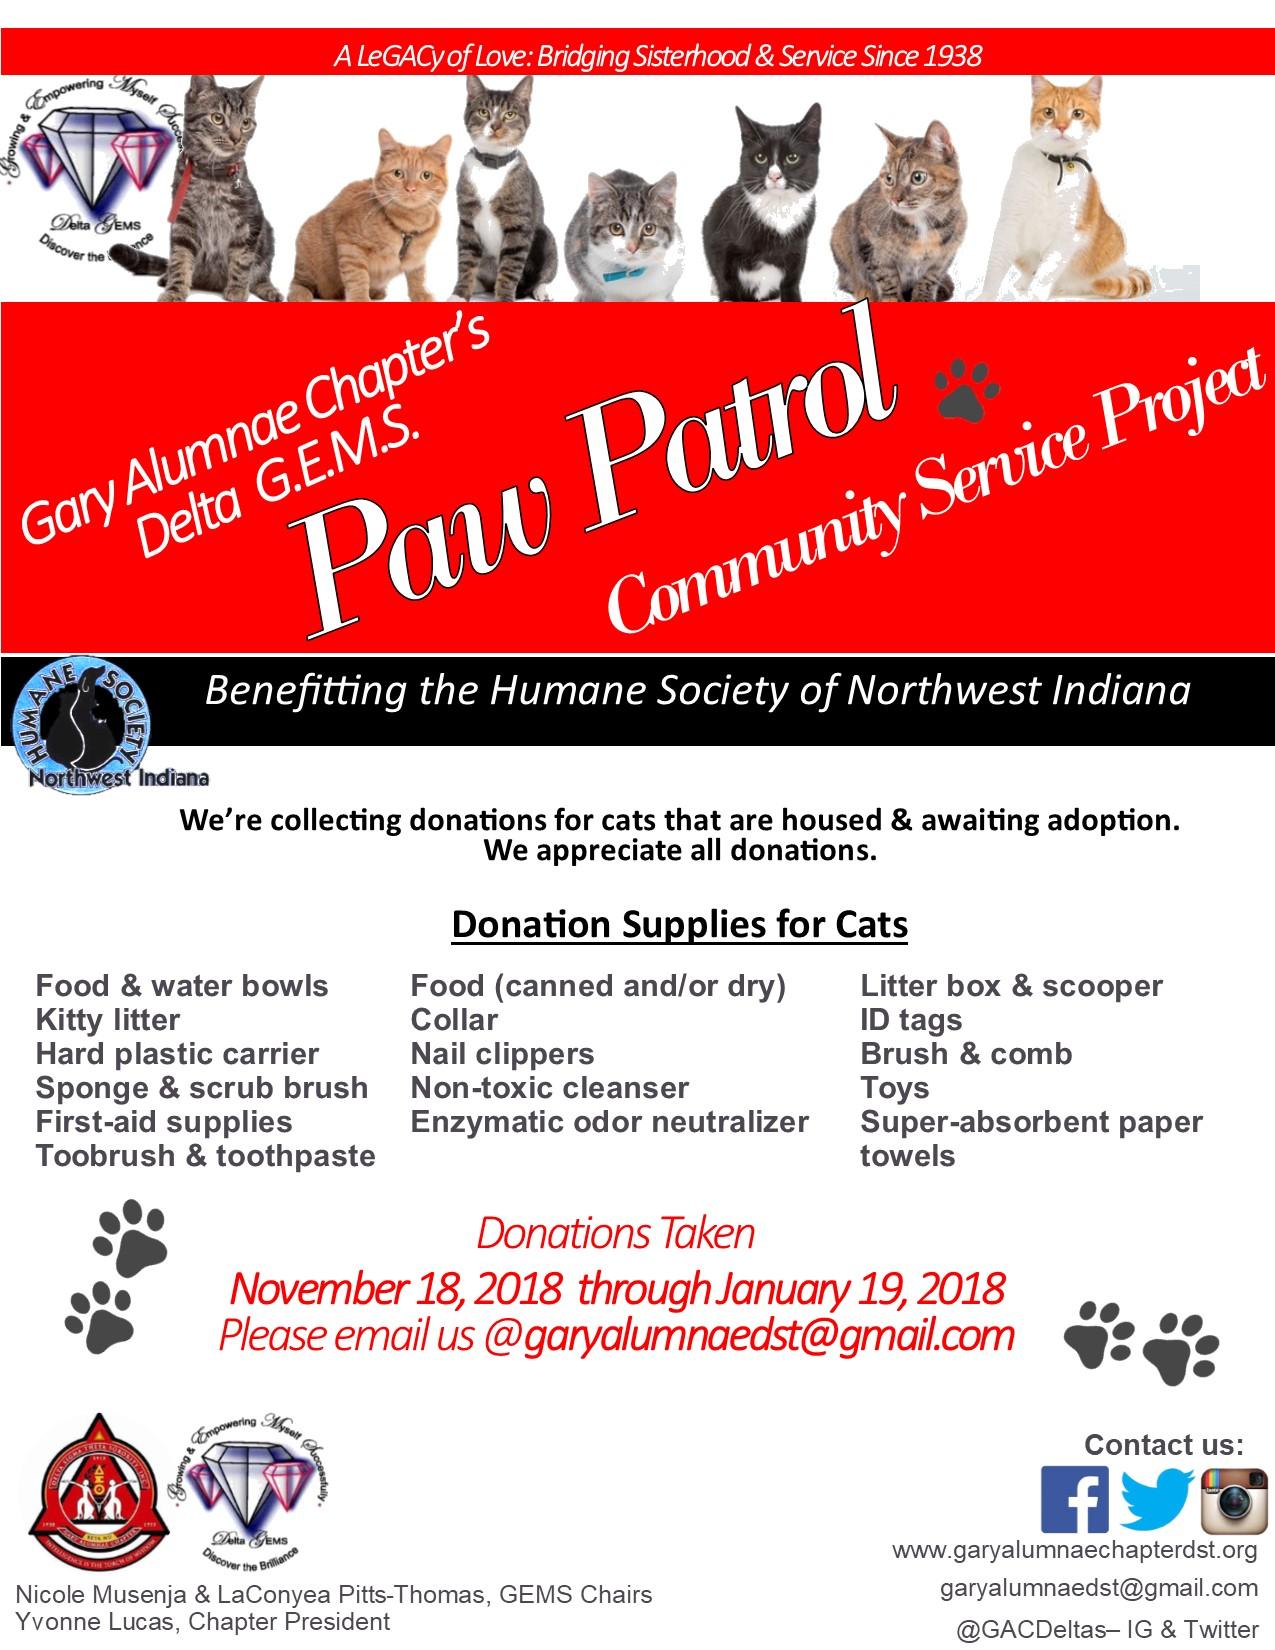 Paw Patrol Service Event